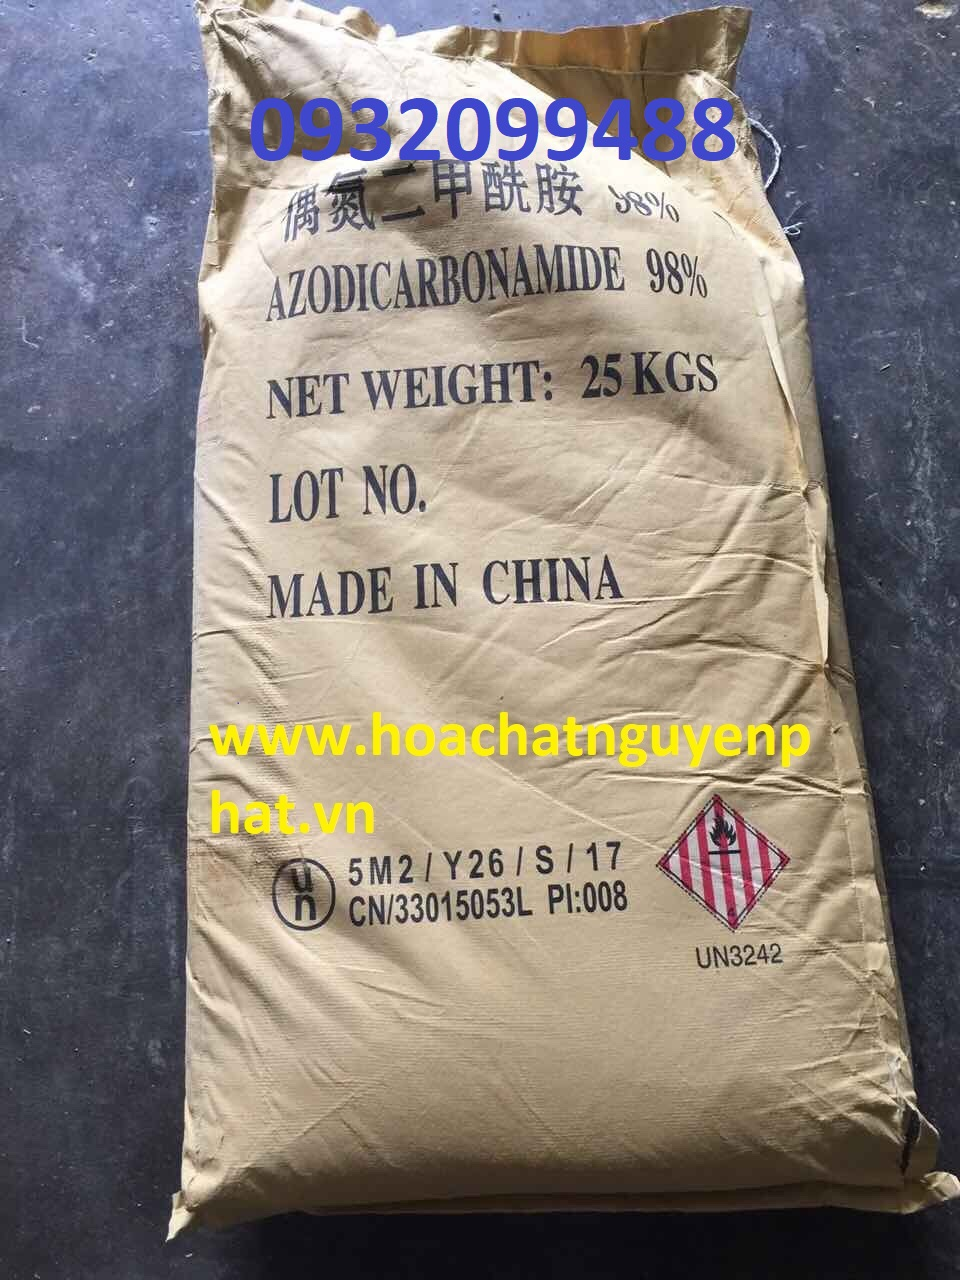 AZODICARBONAMIDE 98% bột nở